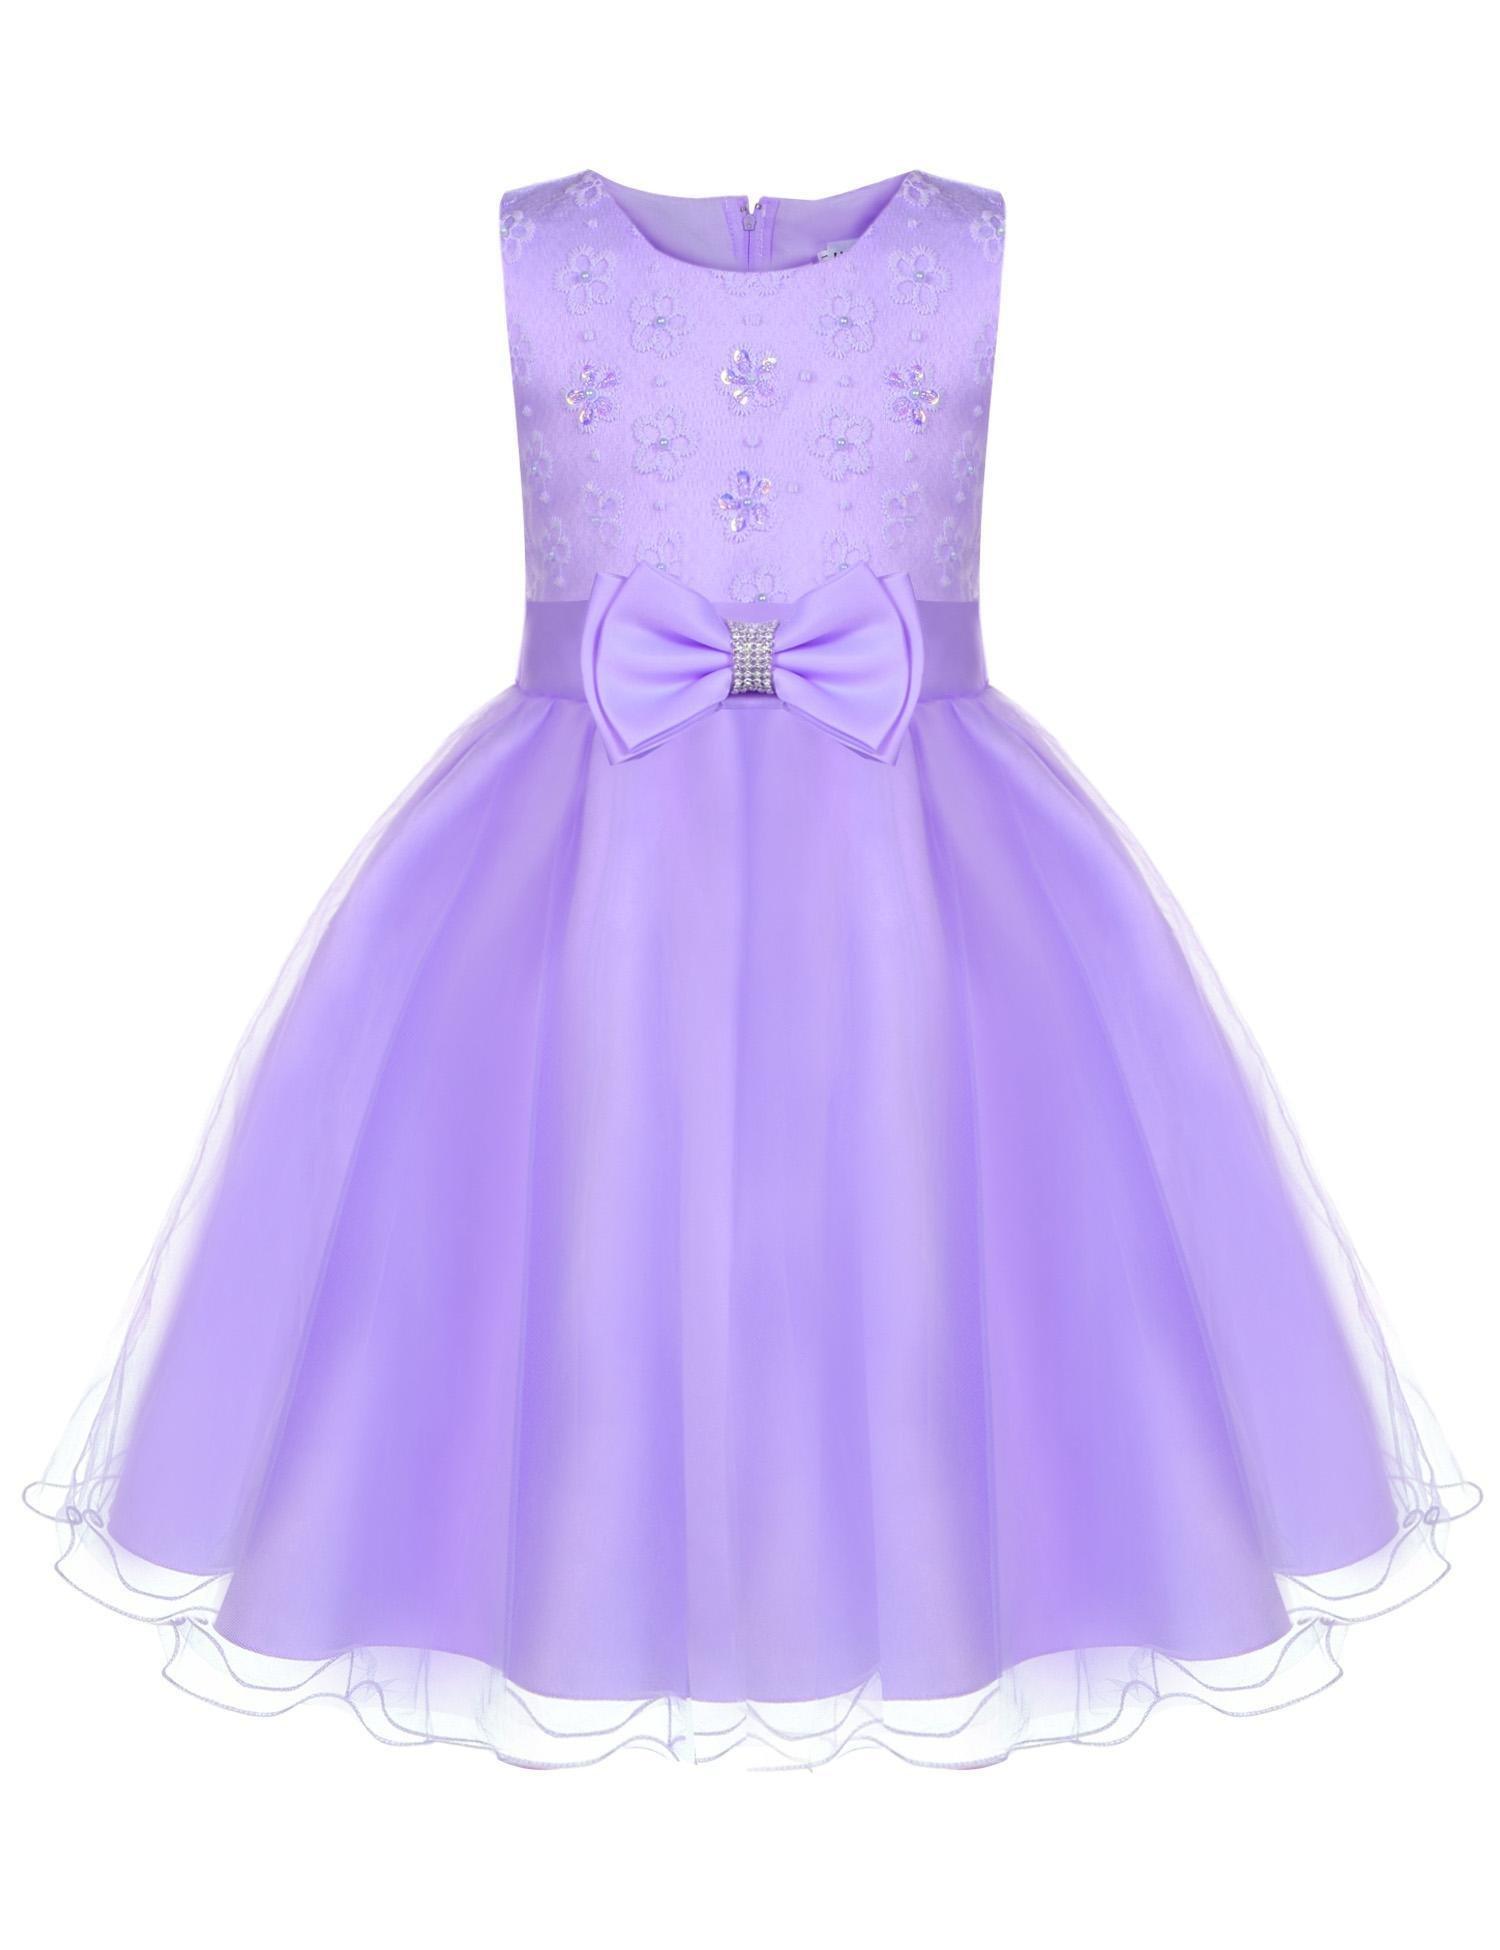 d02f61248 Galleon - DonKap Girls Lace Wedding Party Dresses Flower Girl Birthday Dress  Purple 7-8Y